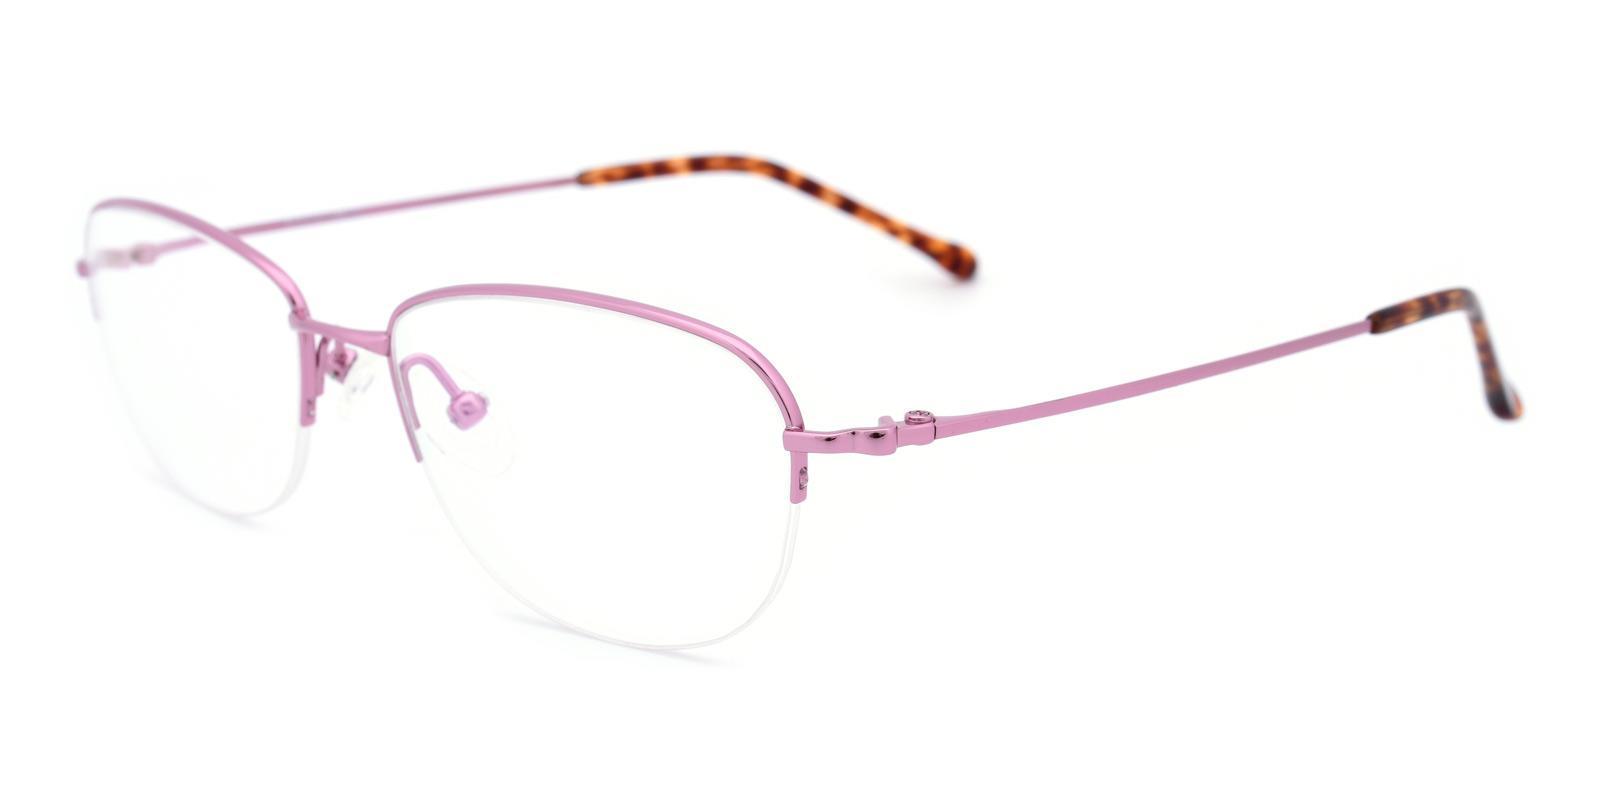 Melody-Pink-Oval-Titanium-Eyeglasses-detail